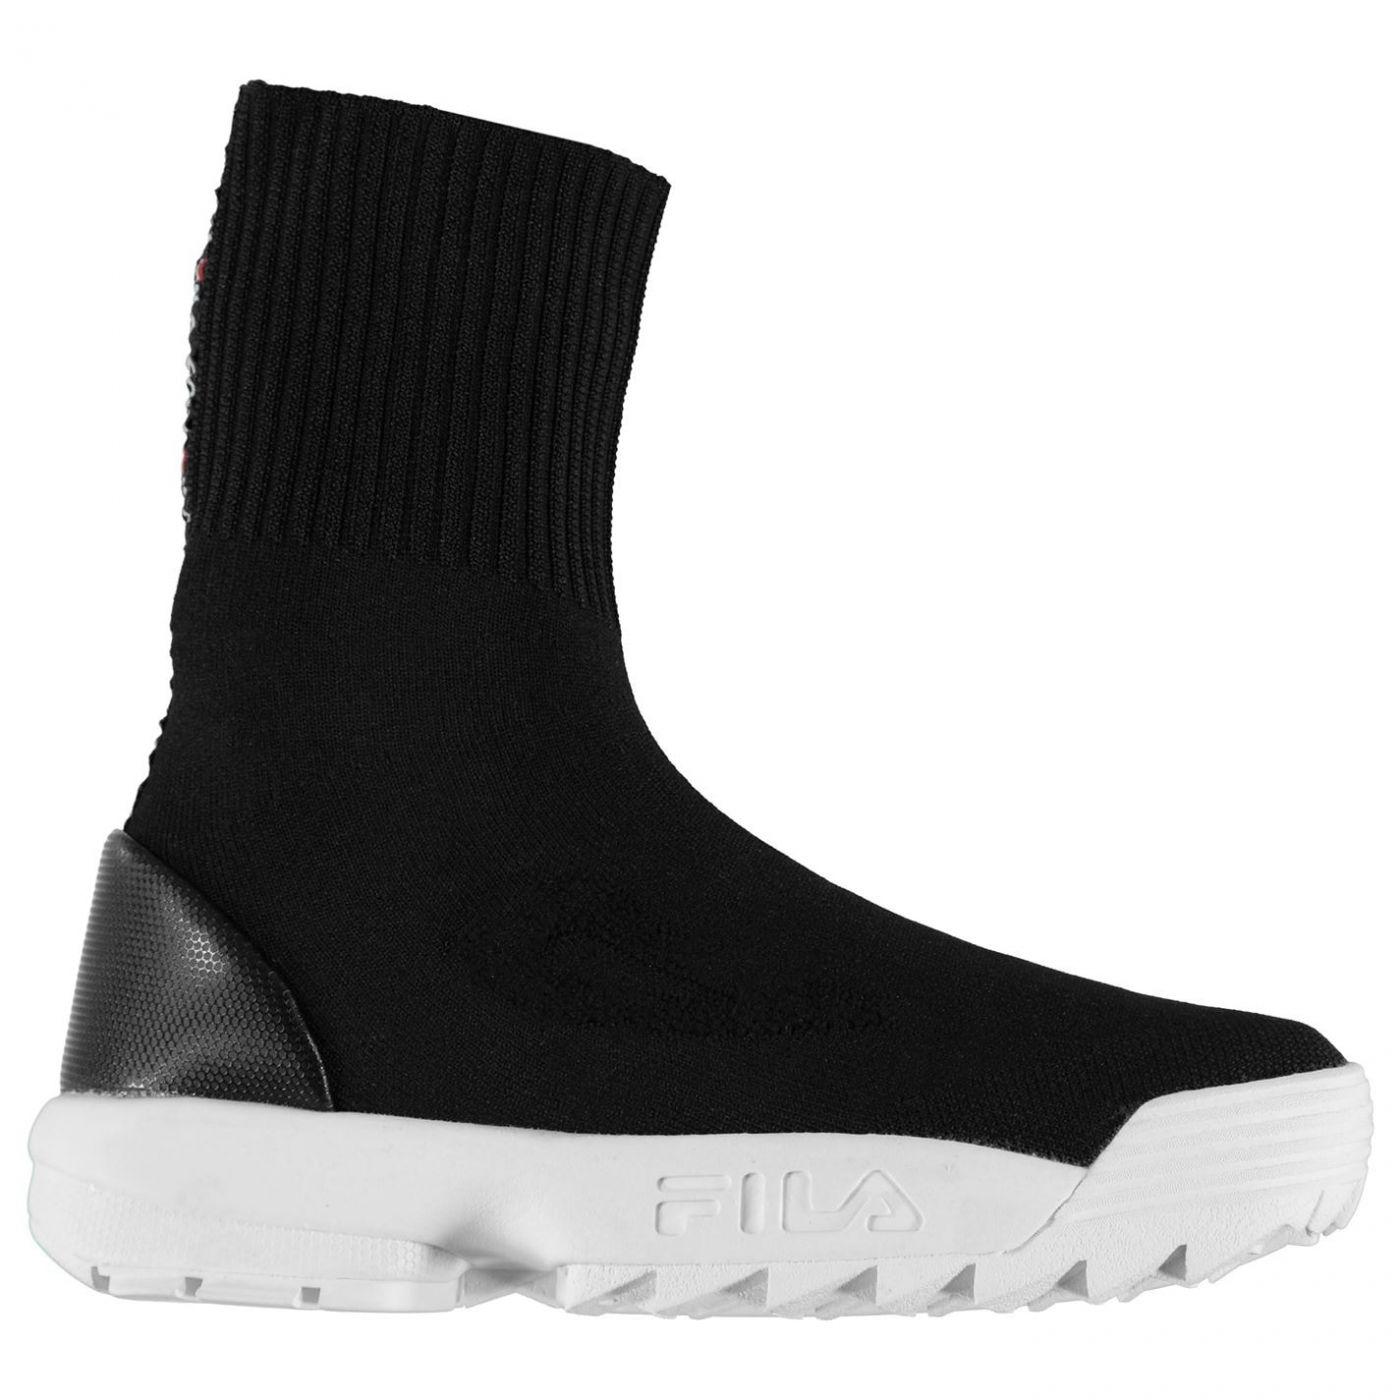 Fila Disrup Sockb Ld C99